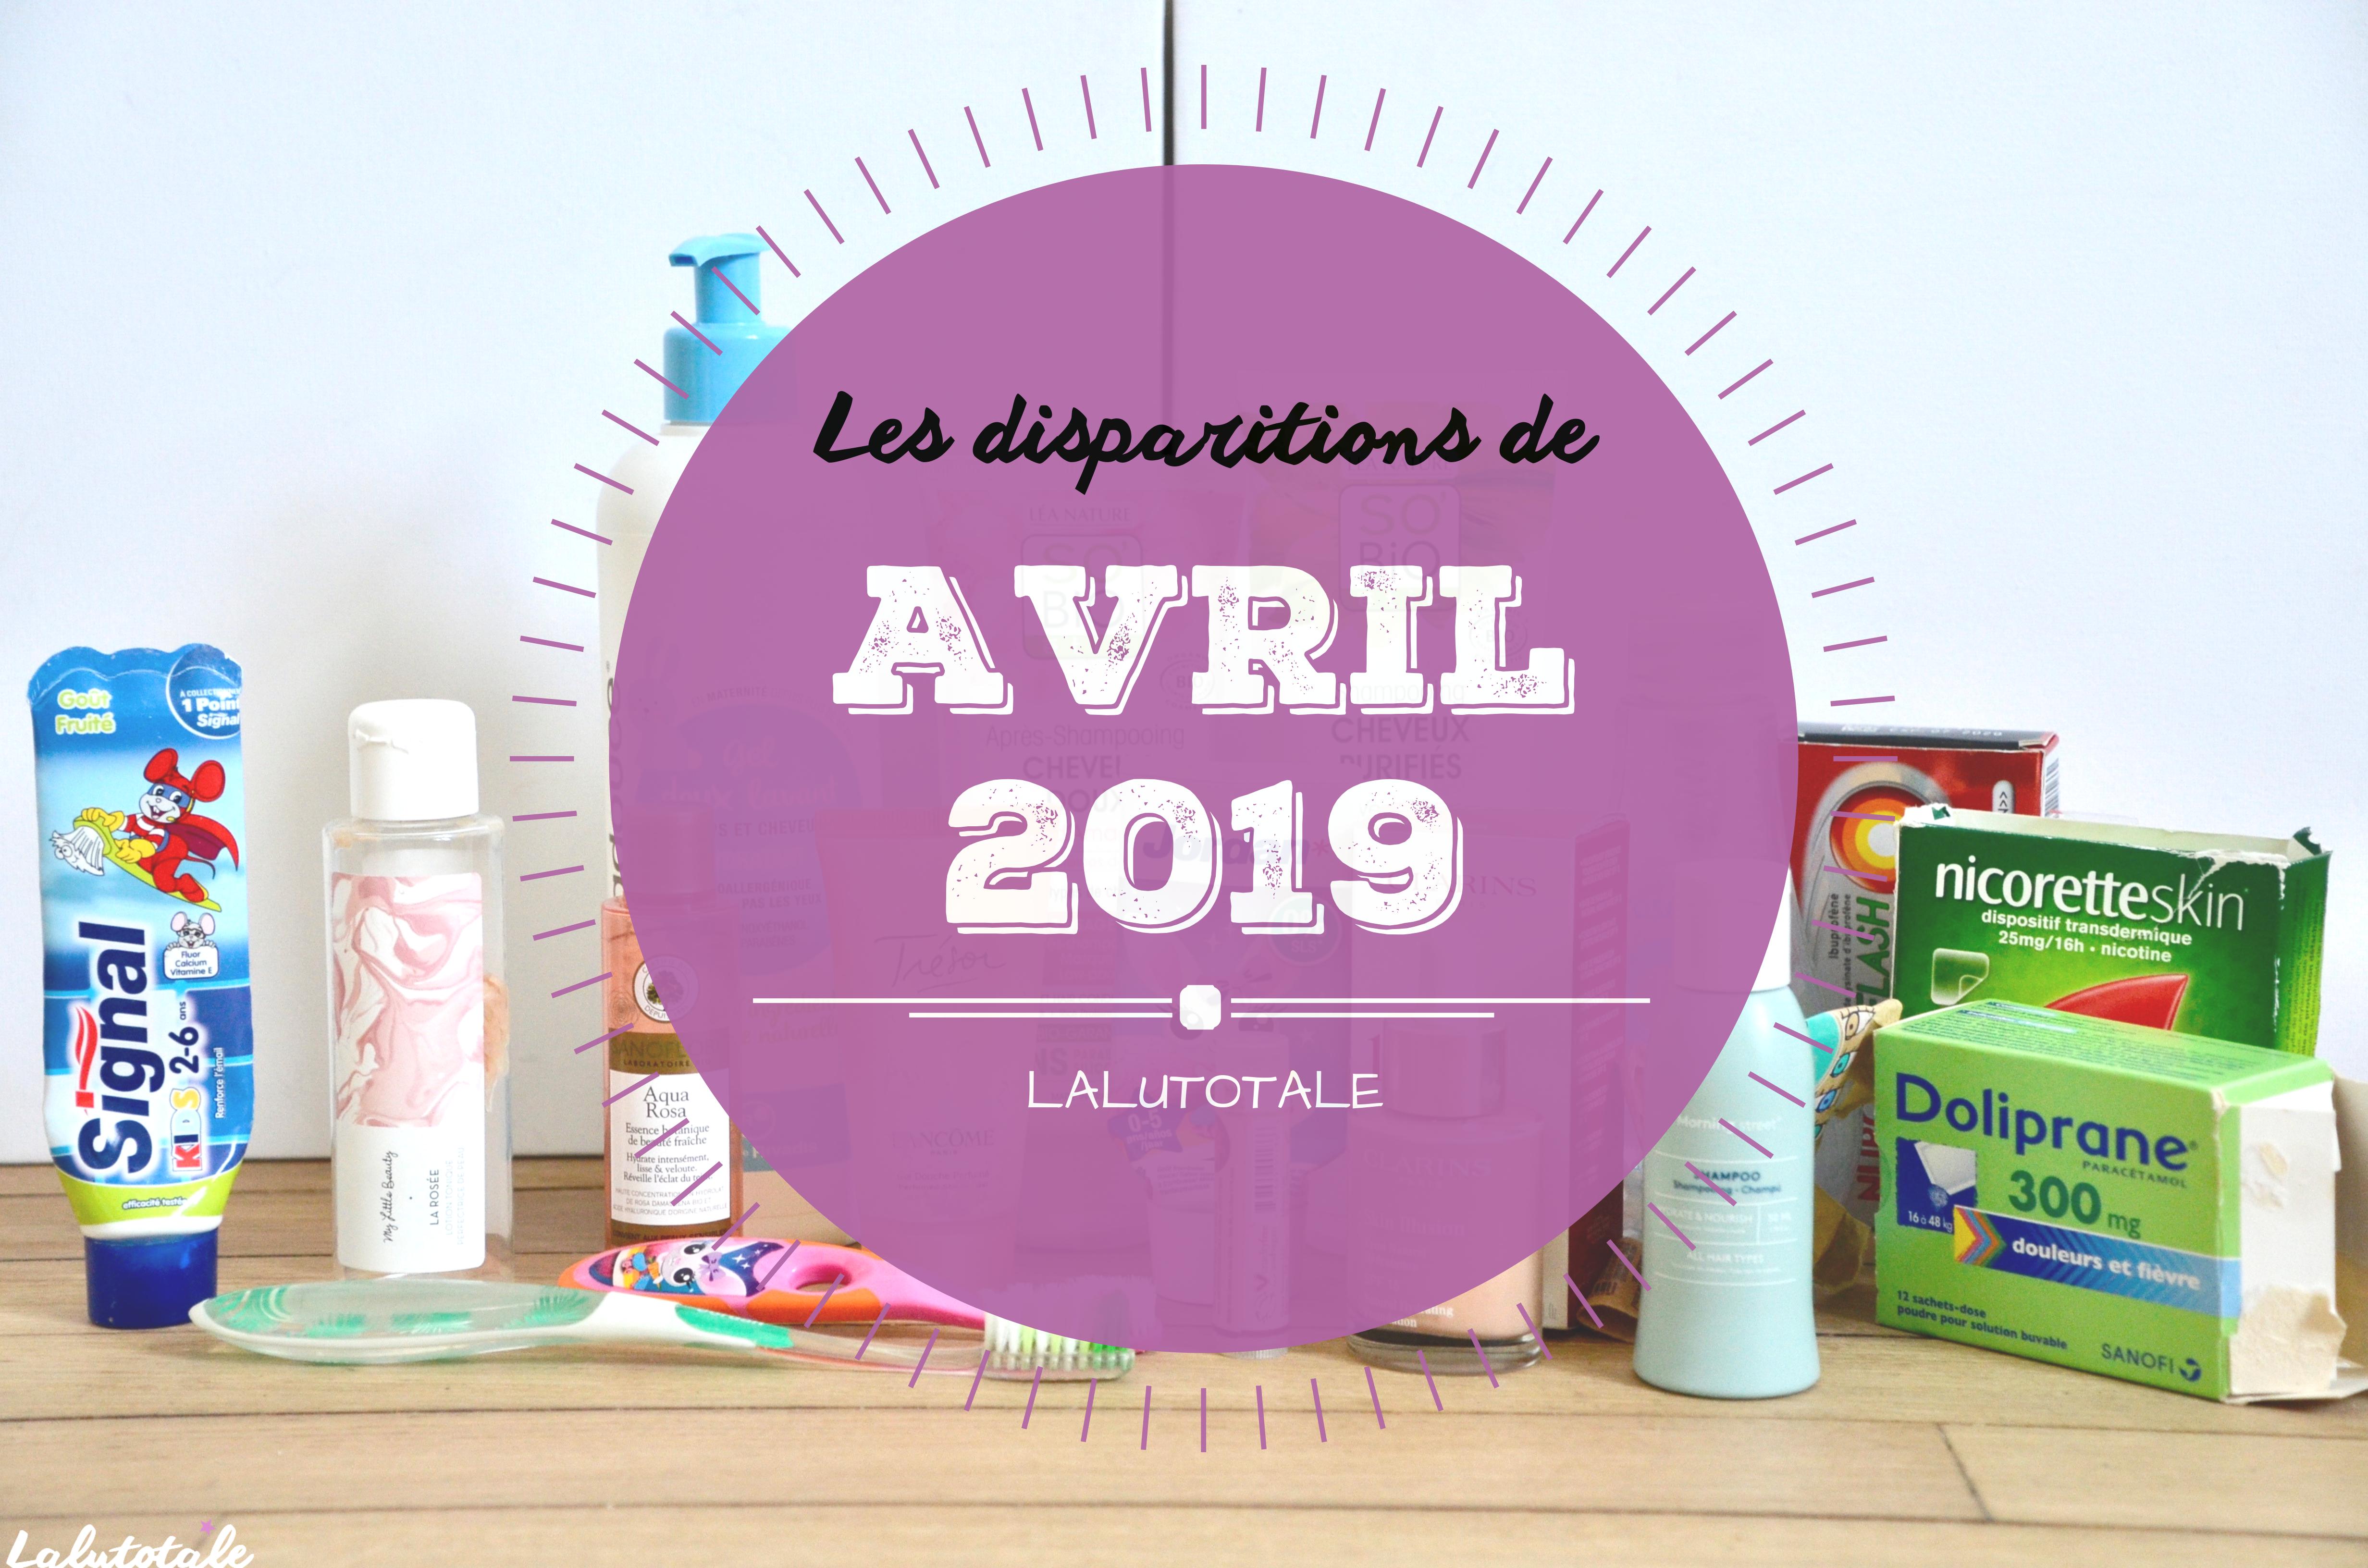 ✞ Les disparitions d'Avril 2019 ✞